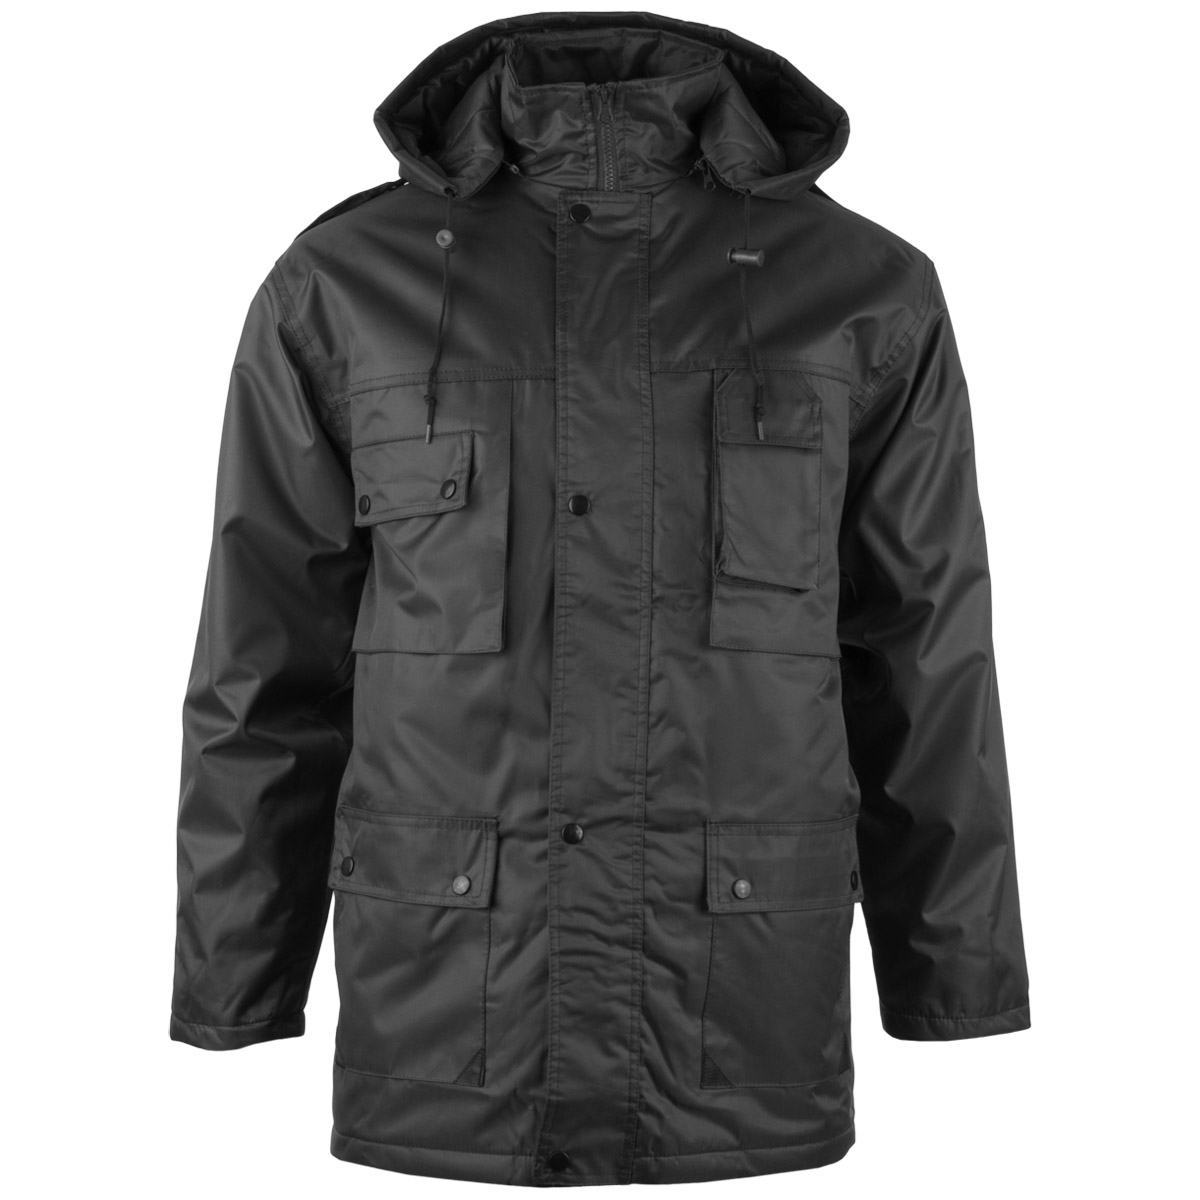 Mil-Tec Parka Dubon Mens Long Hooded Jacket Warm Winter Quilted Coat Cadet Black